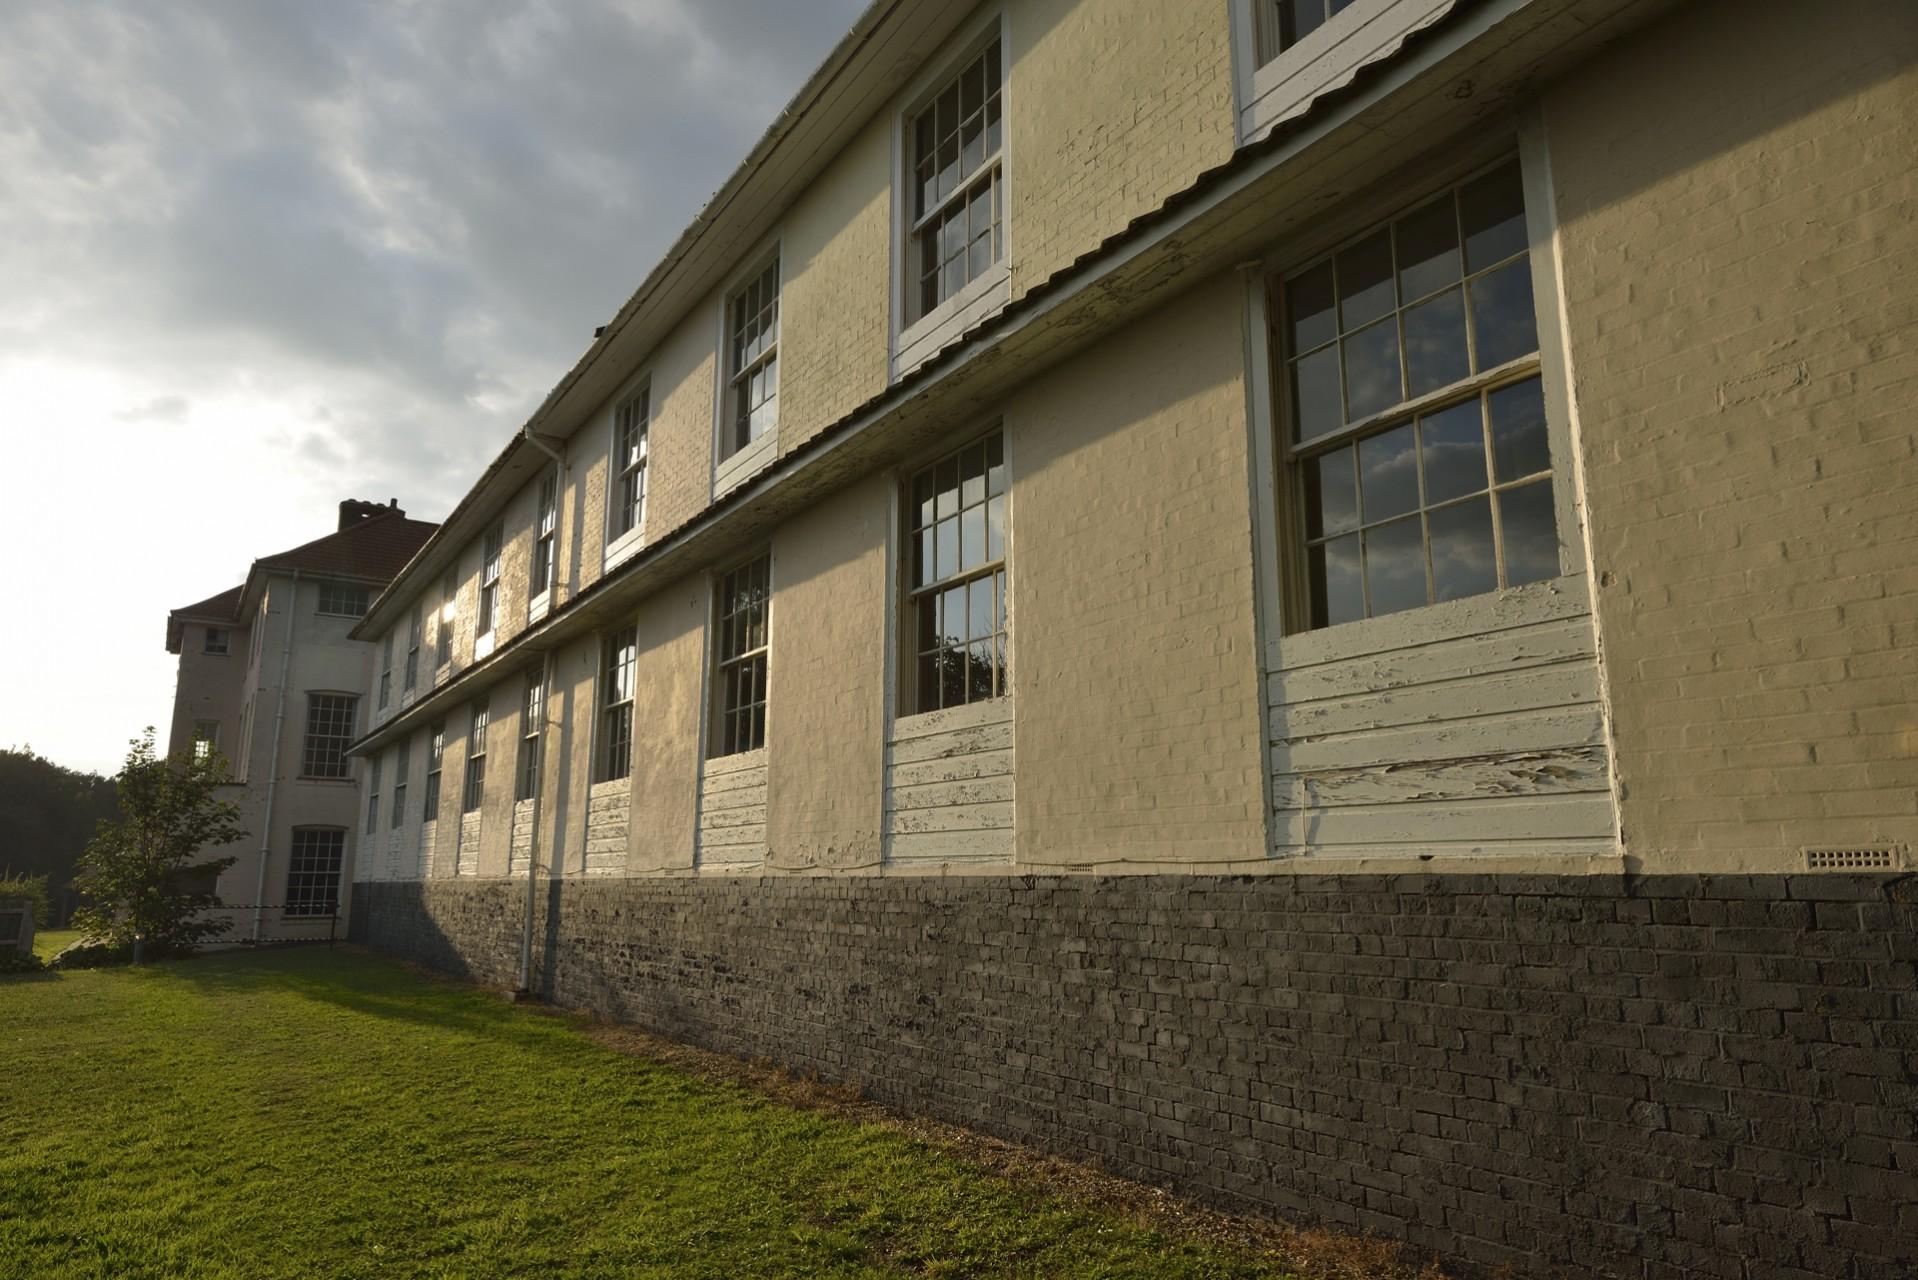 Mundesley TB Sanatorium